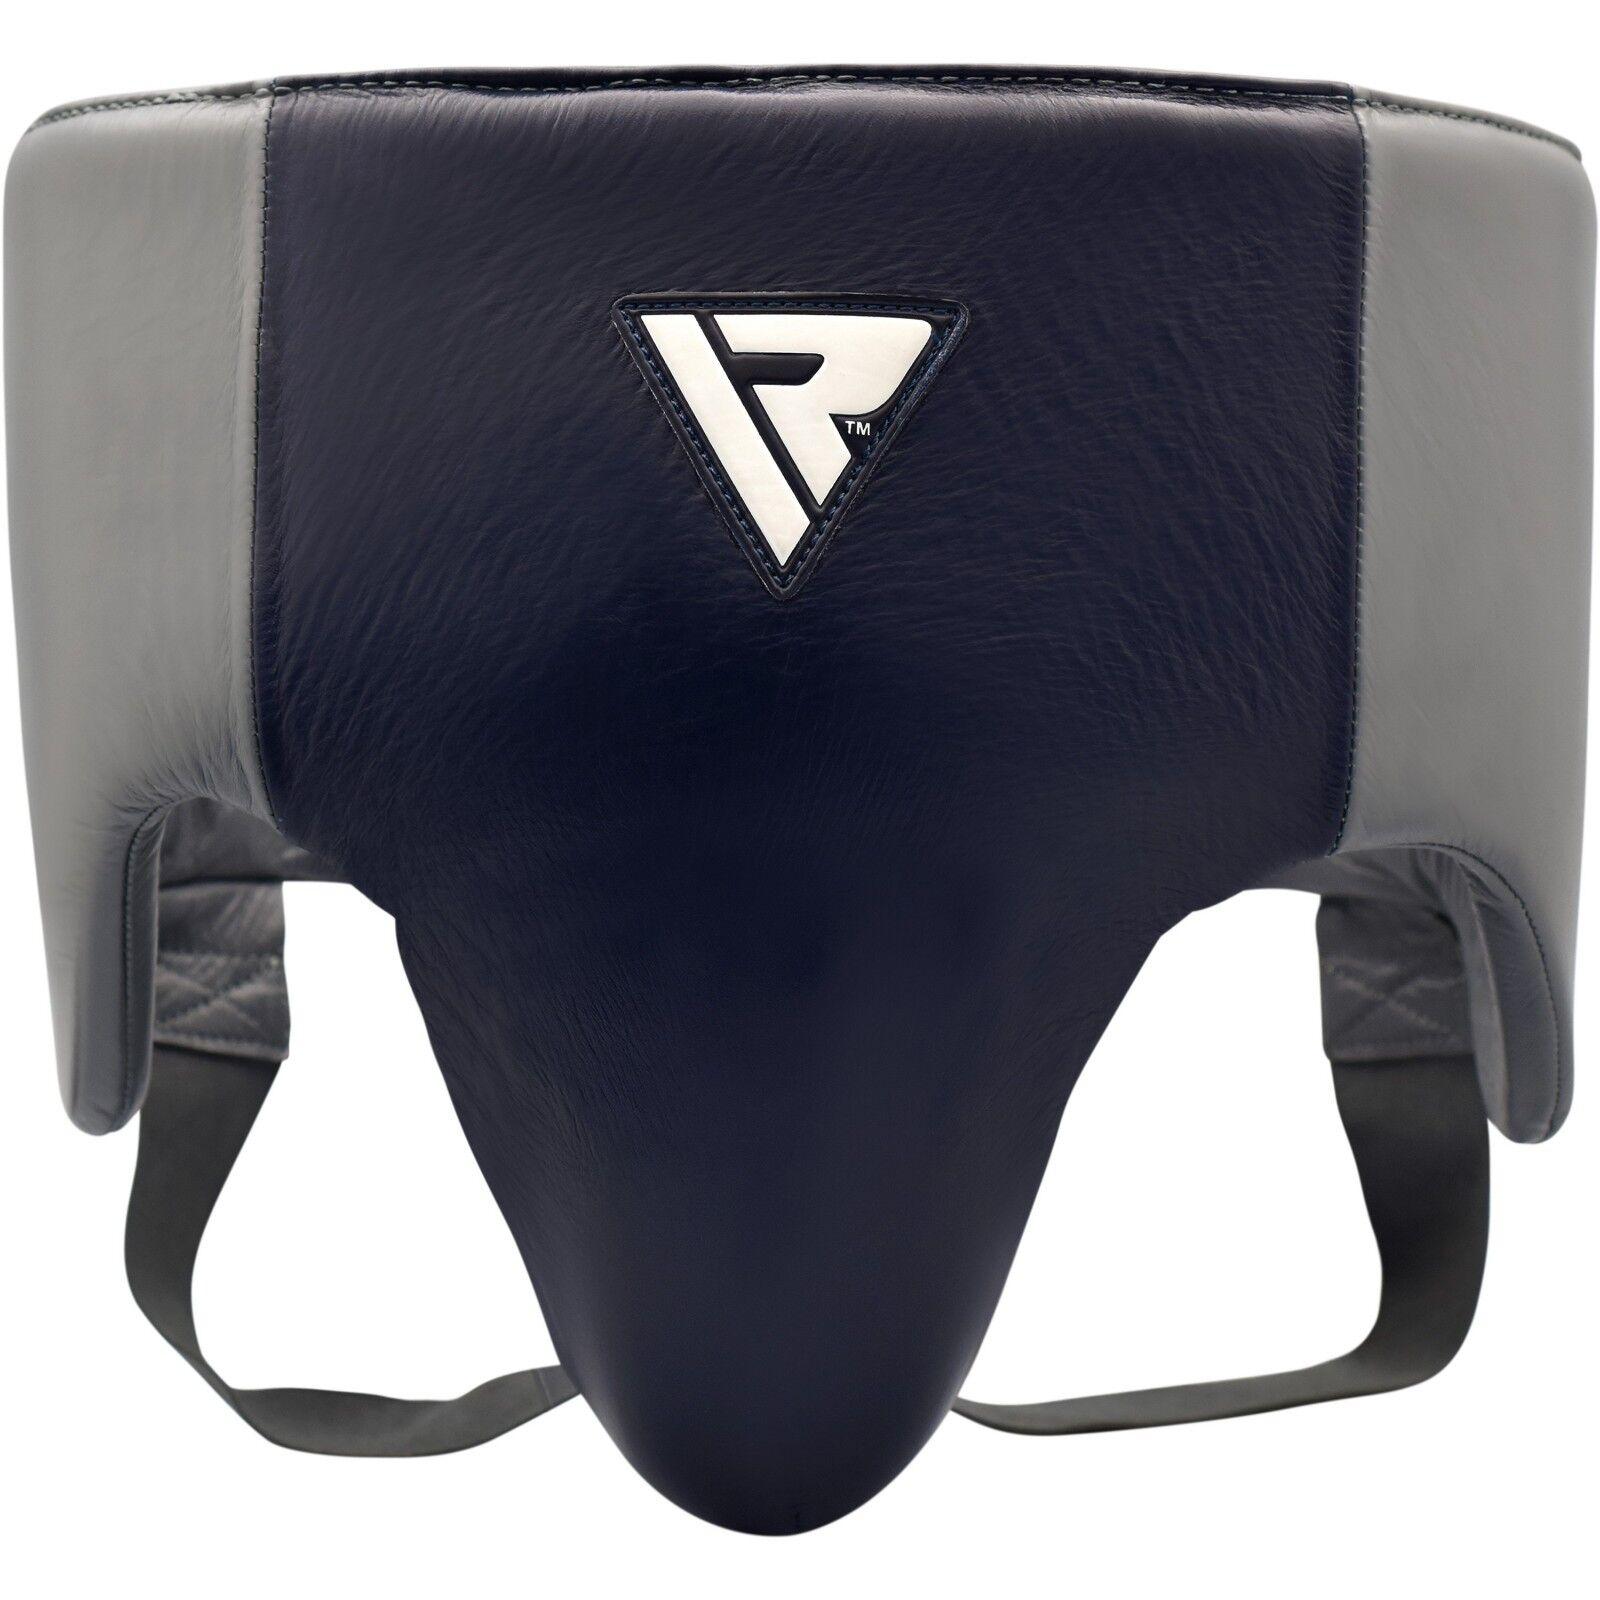 RDX O1 pro Leistenschutz Fouler Schutz Marine Grau Schutz Boxen Sparring